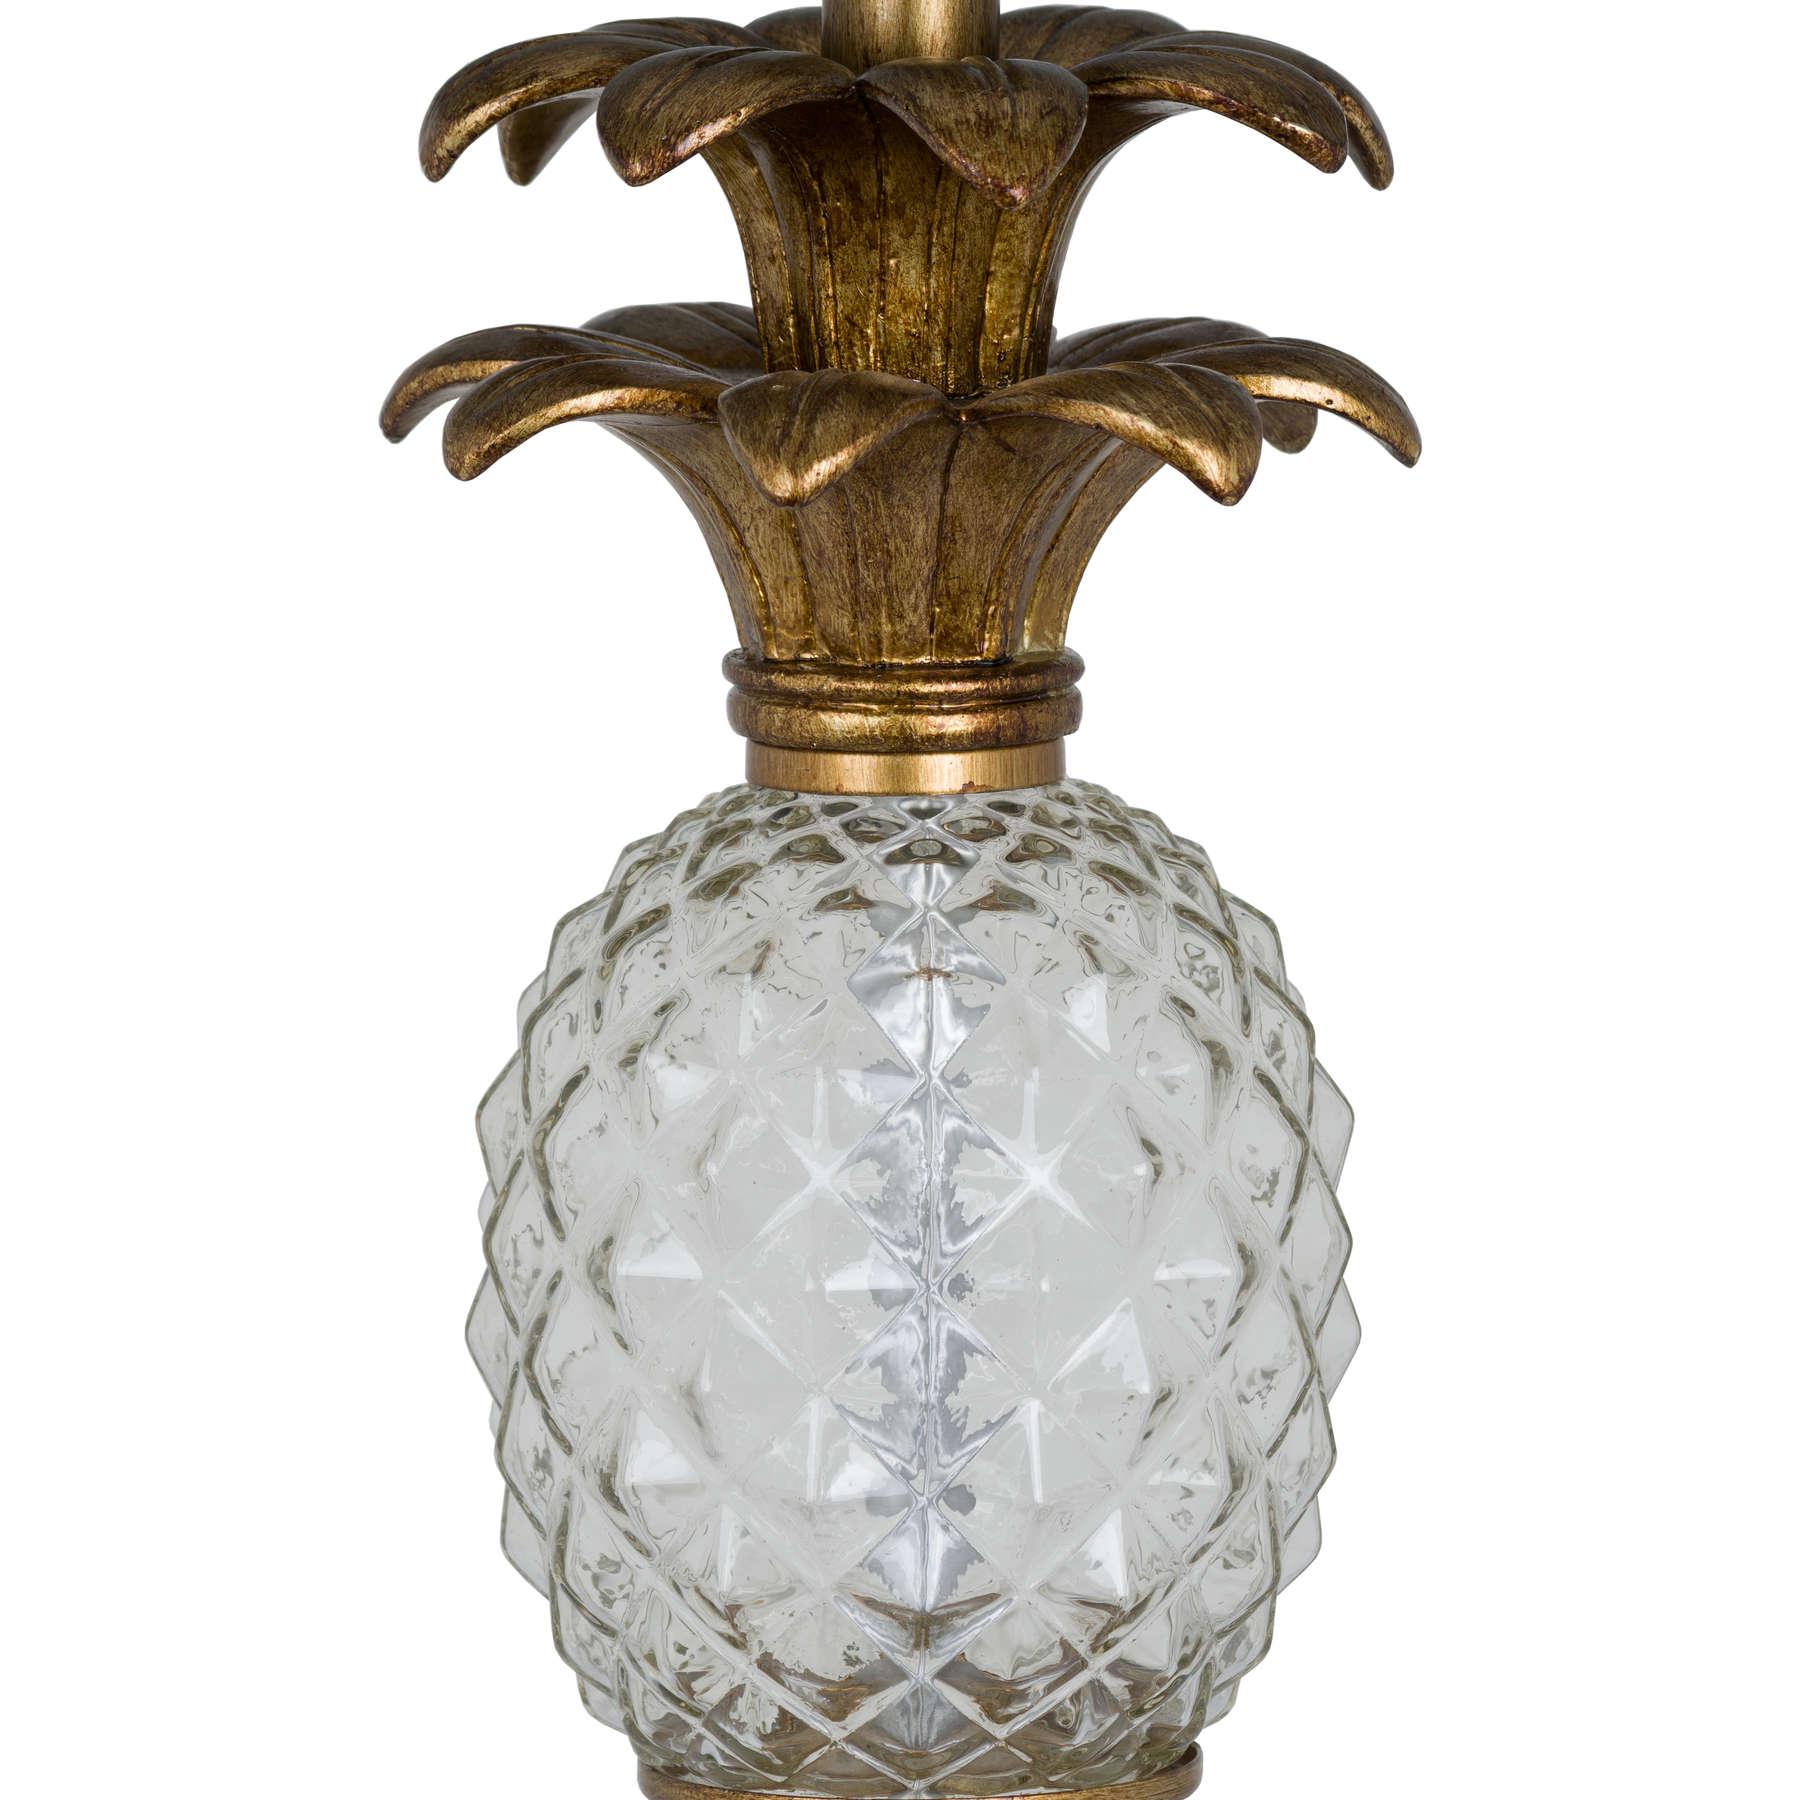 Ananas Pineapple Table Lamp